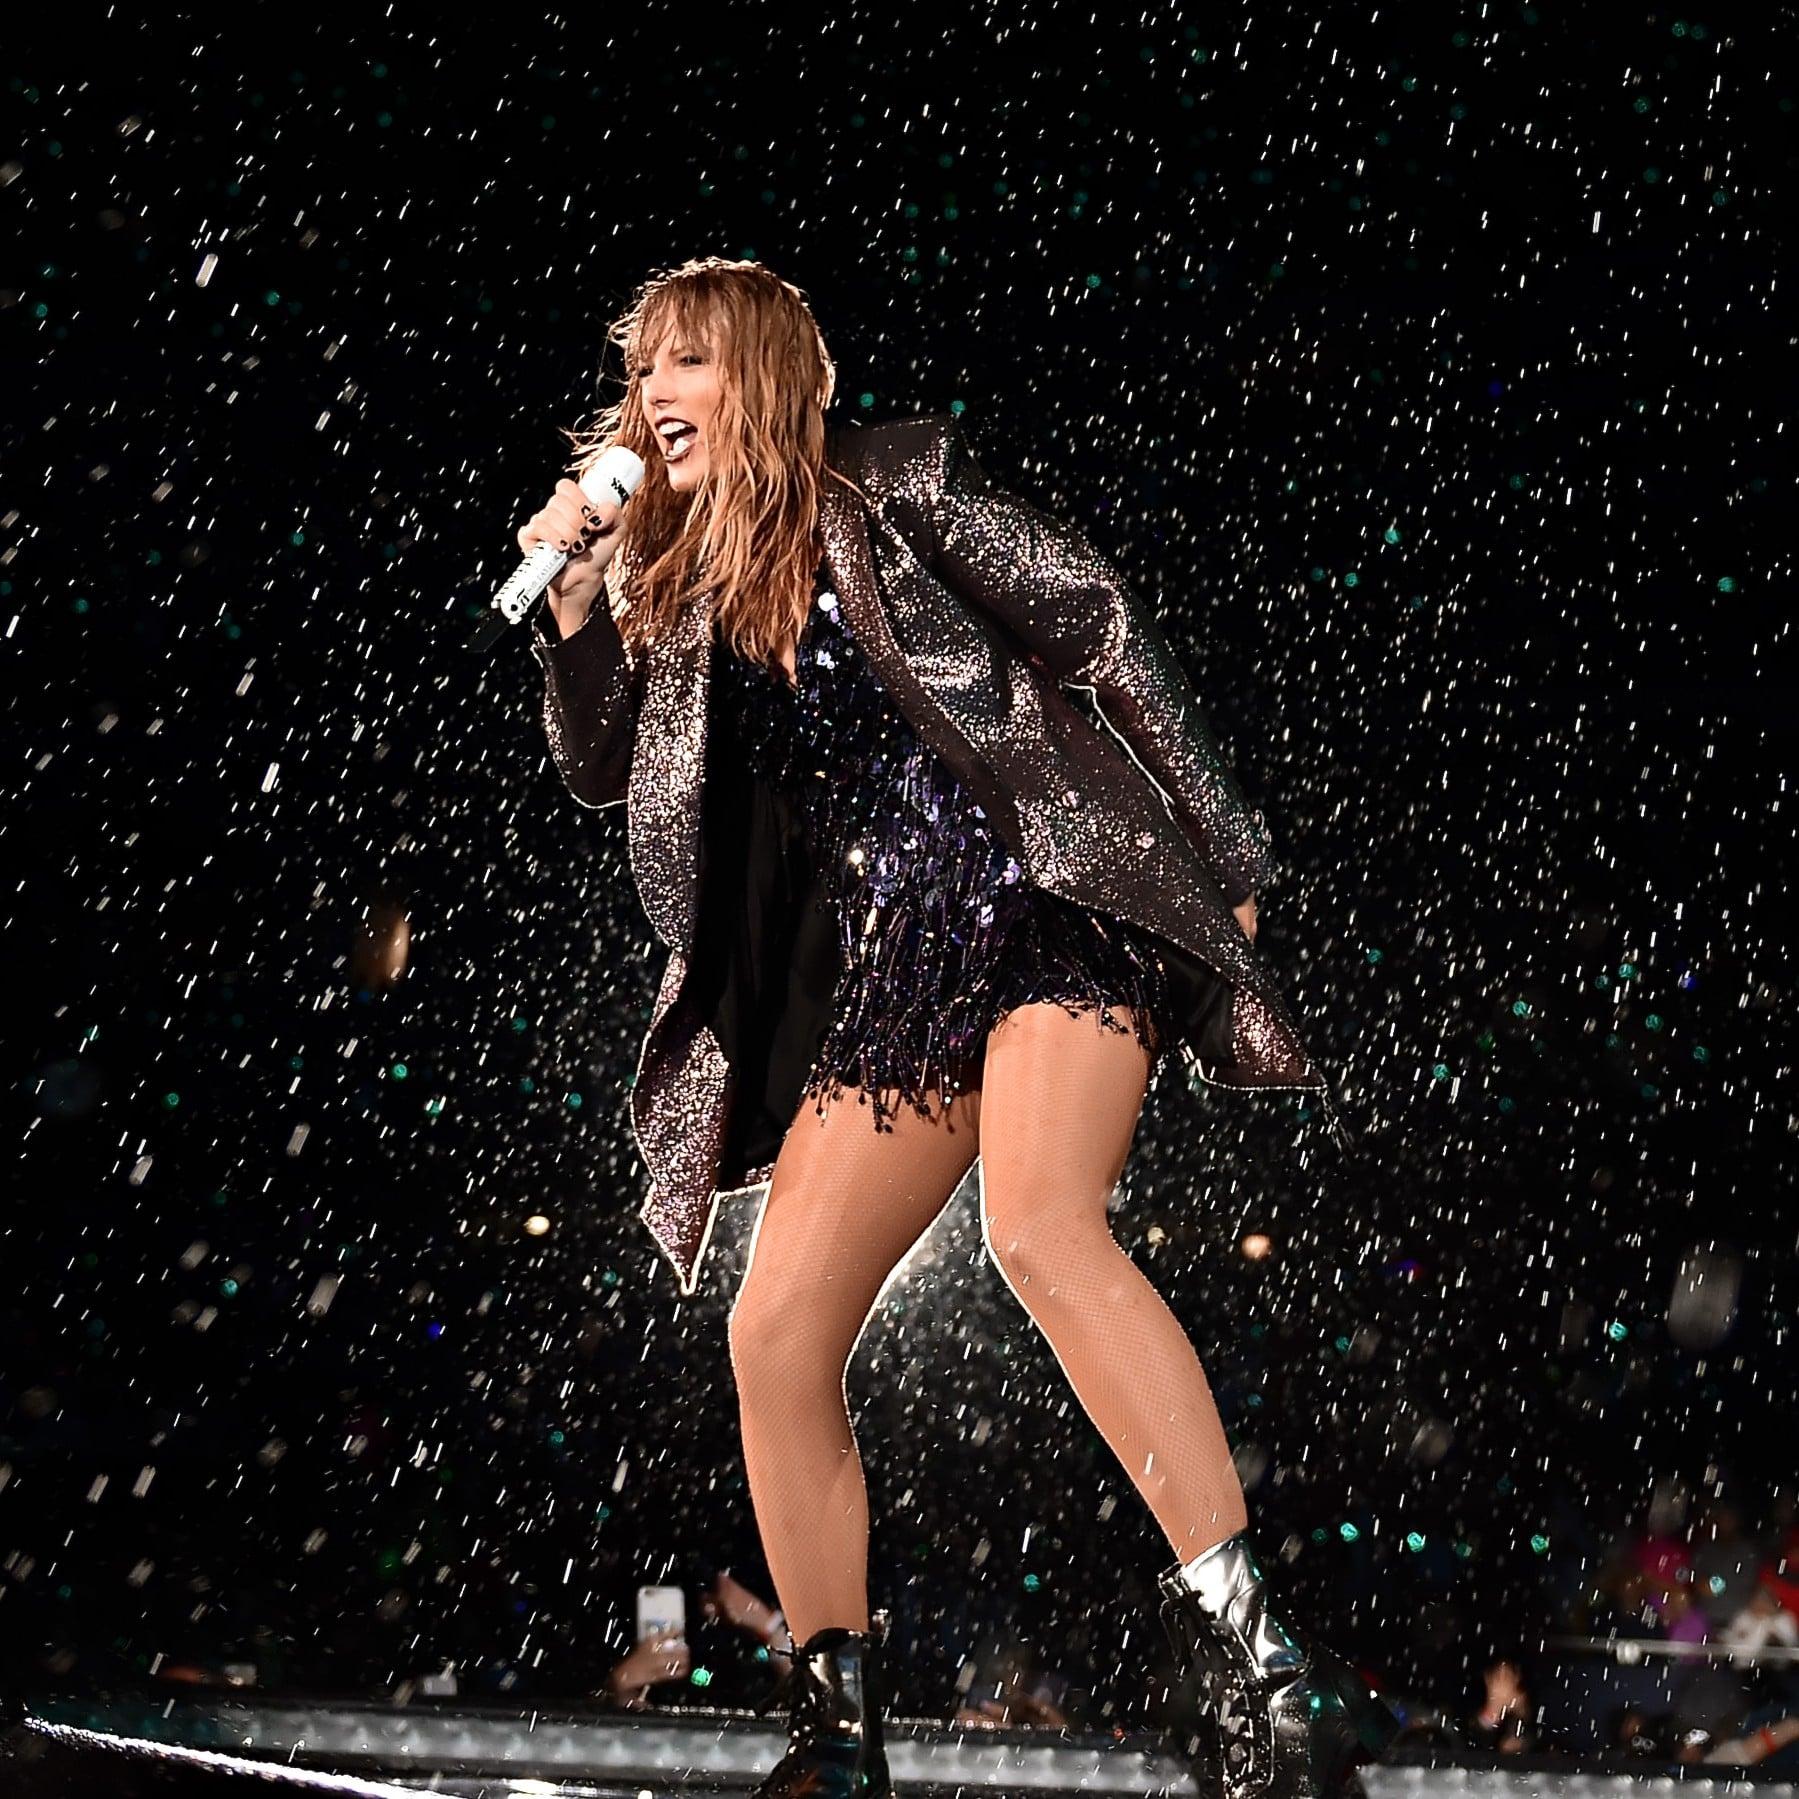 Taylor Swift Reputation Stadium Tour Pictures   POPSUGAR Celebrity